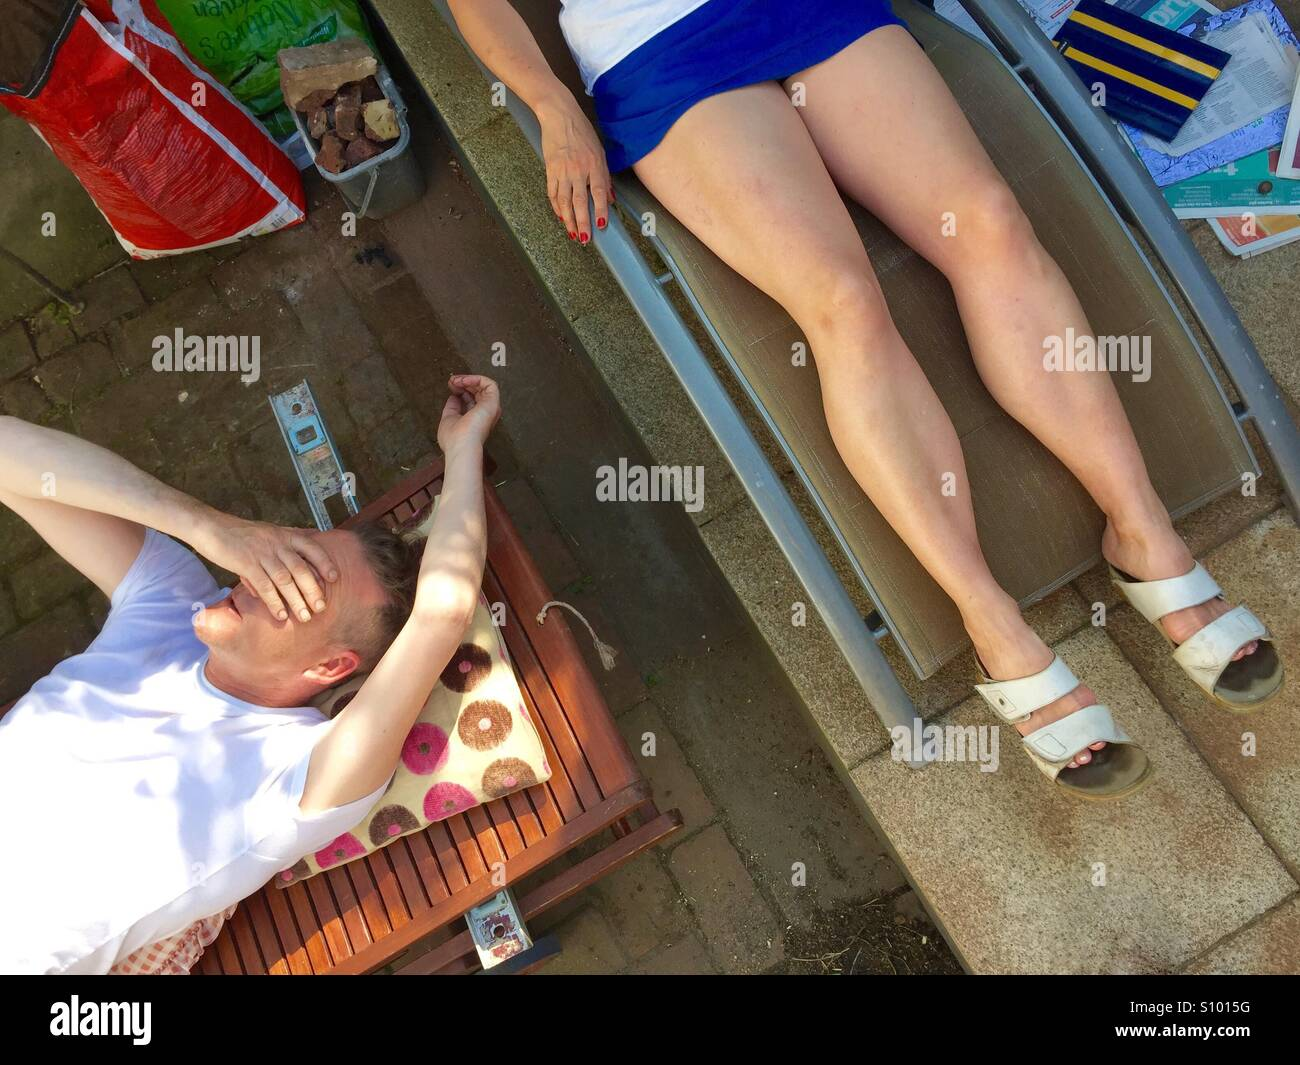 Post-prandial snooze - Stock Image